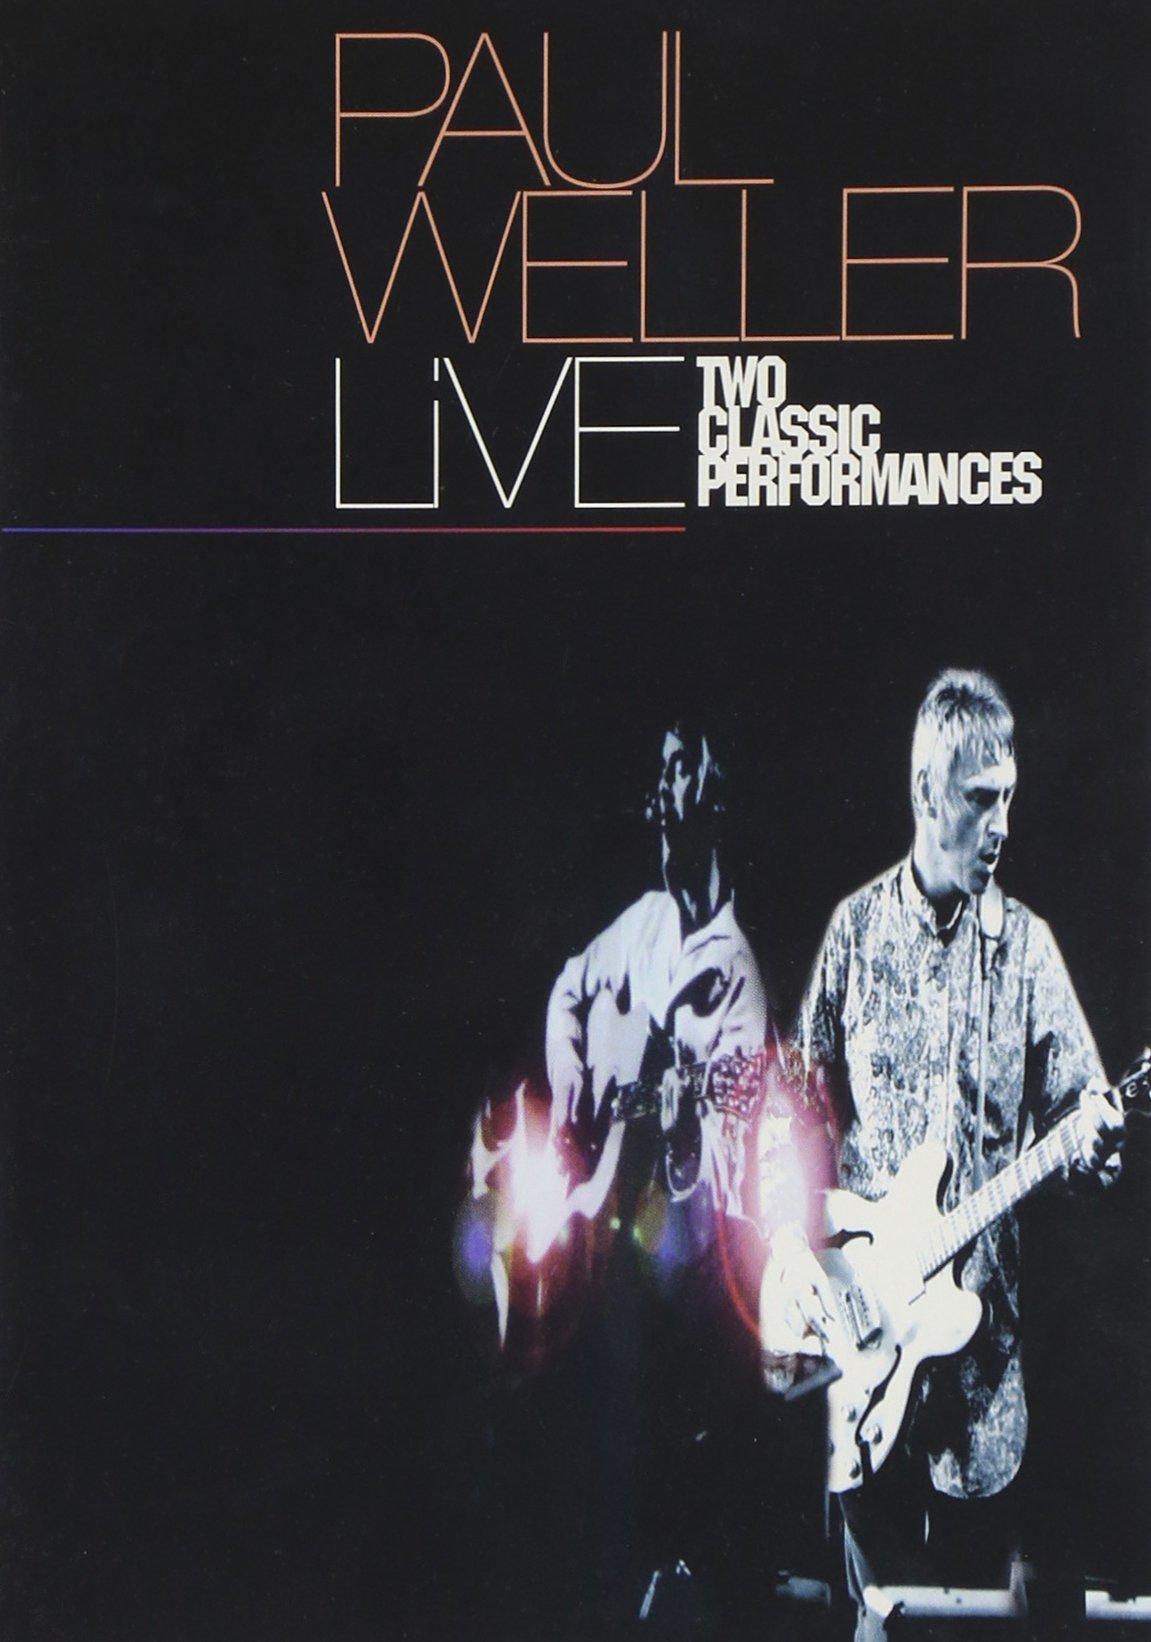 DVD : Paul Weller - Two Classic Performances (DVD)